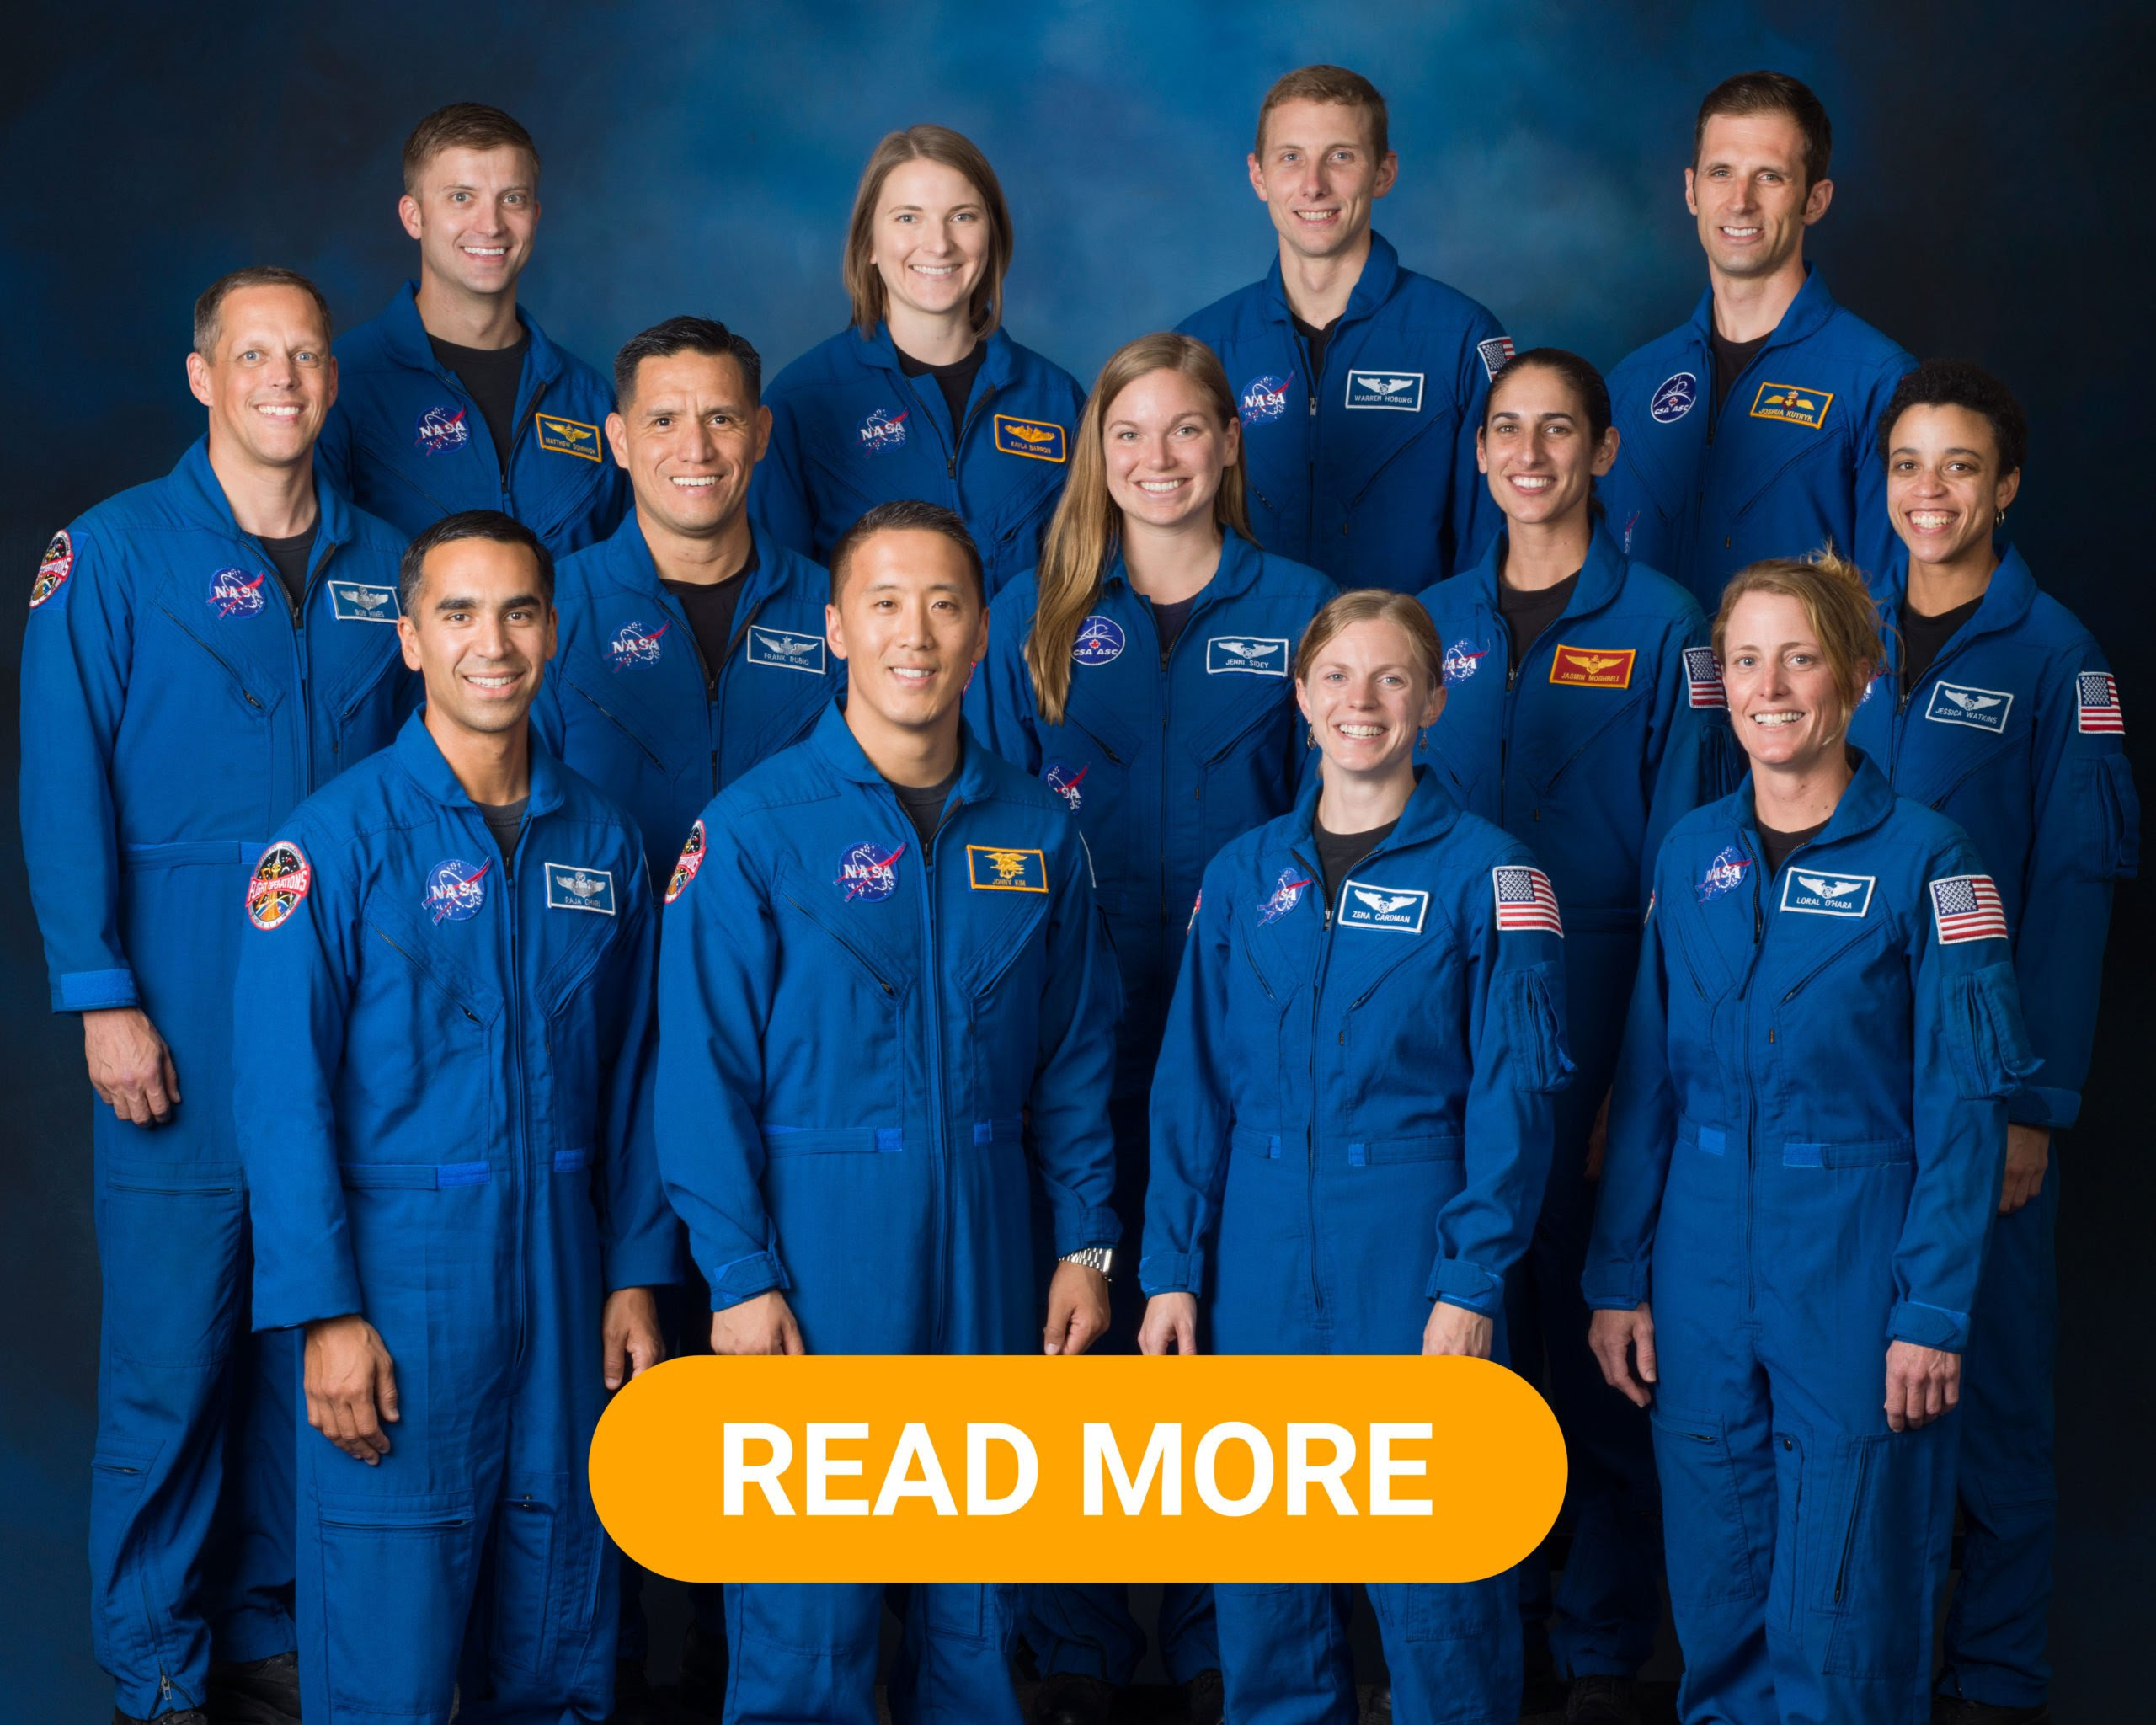 11 new astronauts graduated